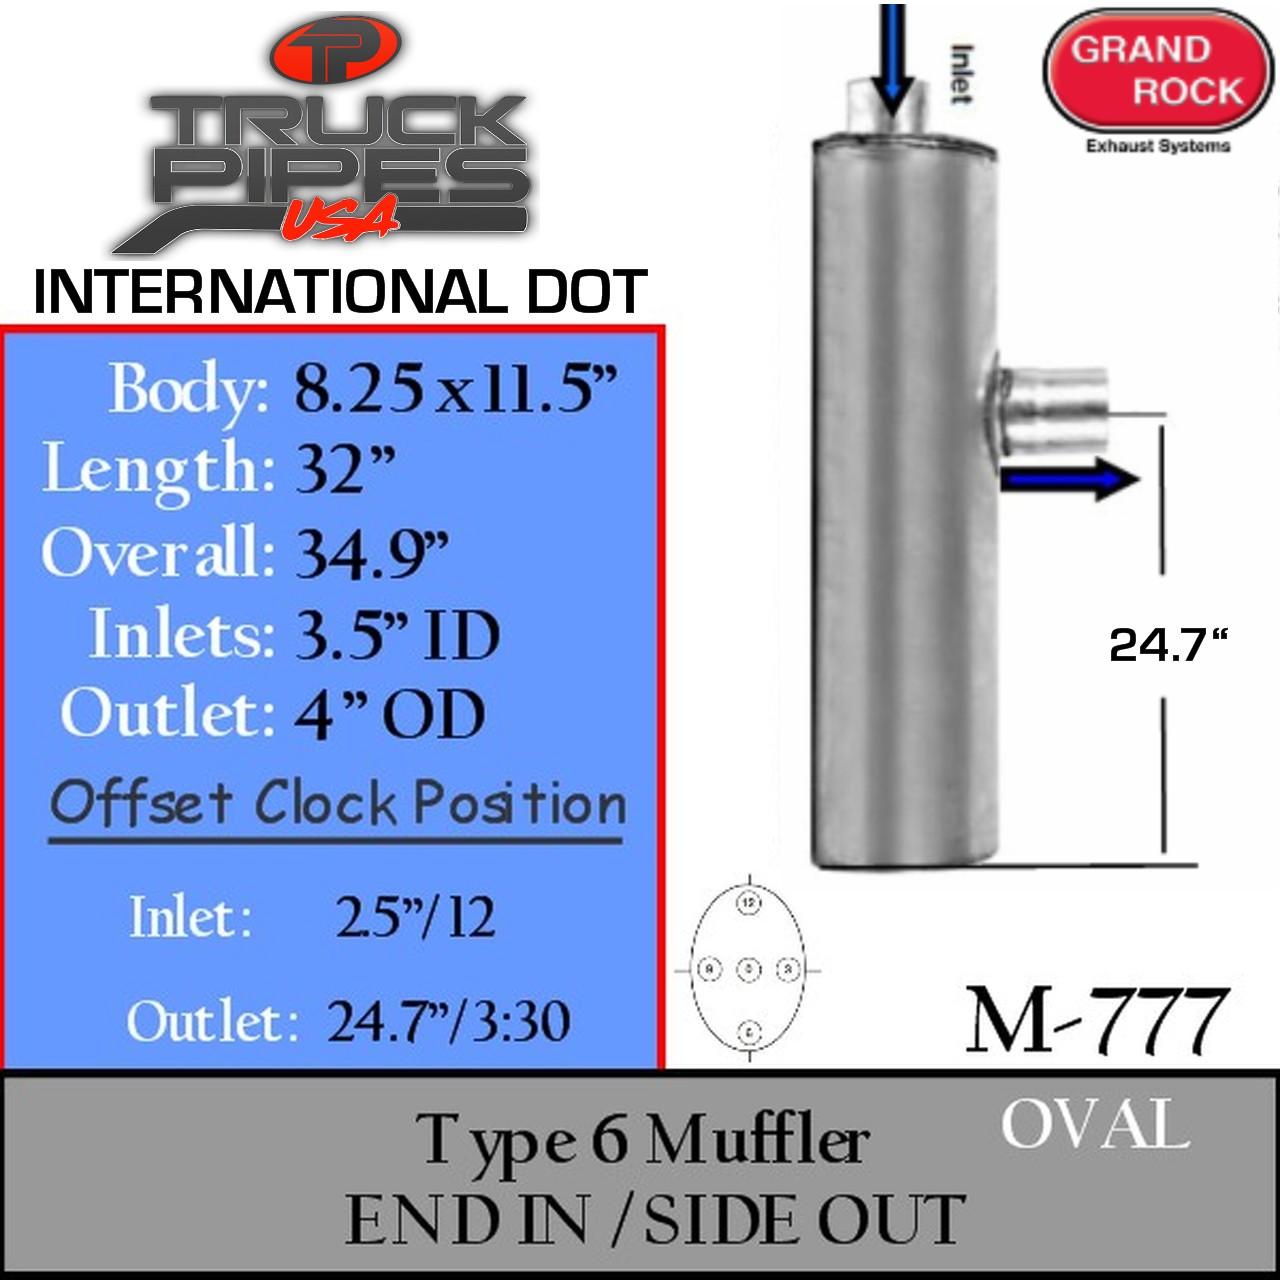 m-777-international-dot-truck-muffler-or-oval-diesel-big-rig-muffler-type6-end-in-side-out-pipe.jpg